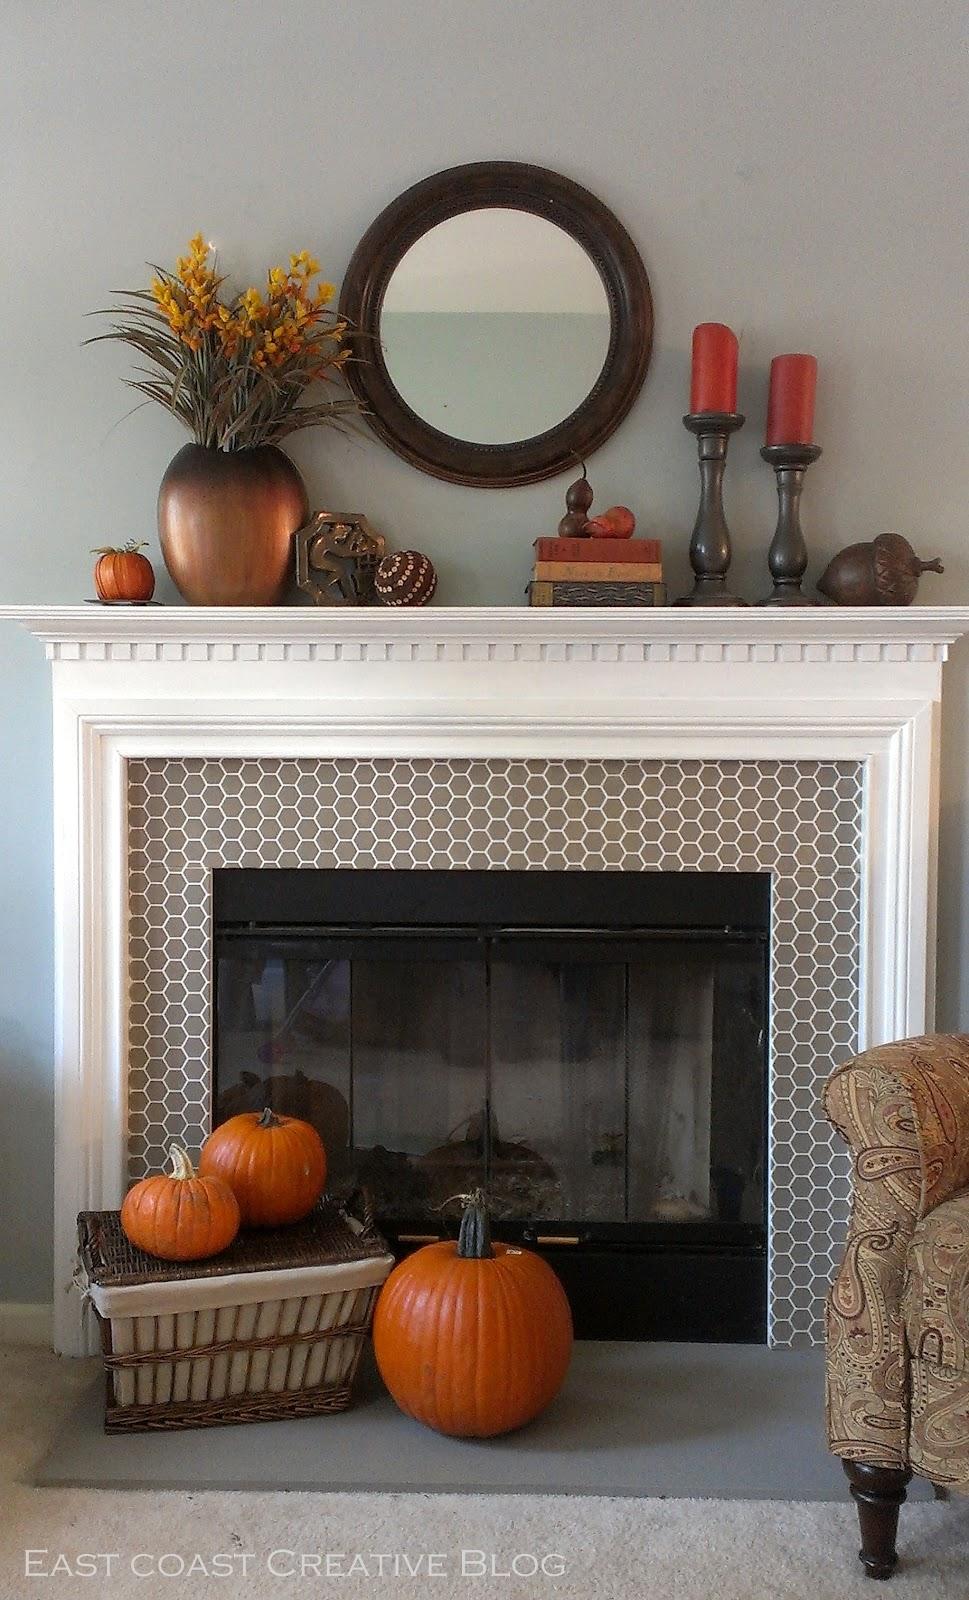 Fall Fireplace Mantel Decorating Ideas: A Fall Mantel: 2 Ways {Mantle}